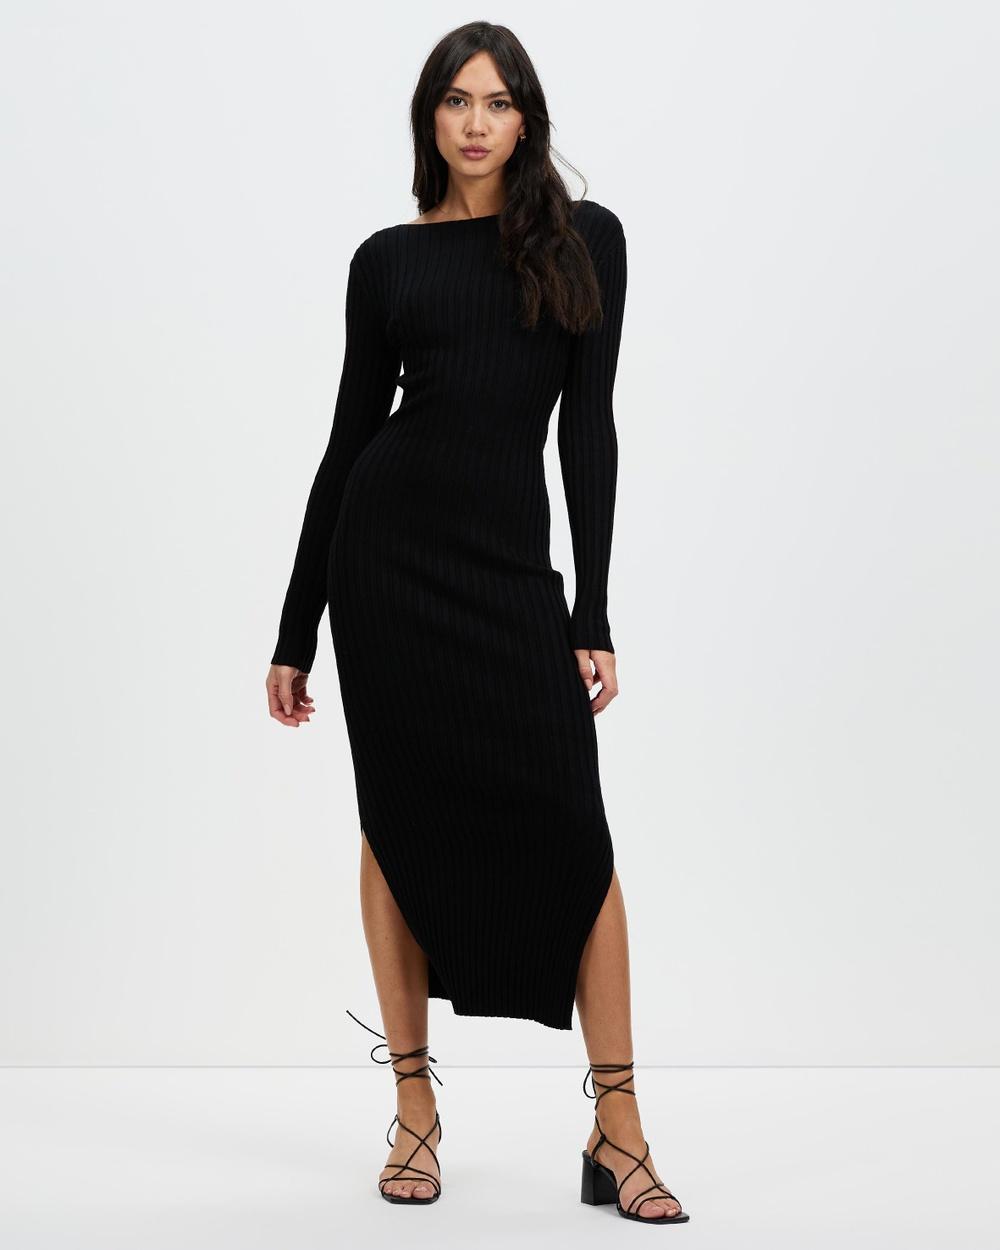 AERE Organic Cotton Blend Knit Dress Bodycon Dresses Black